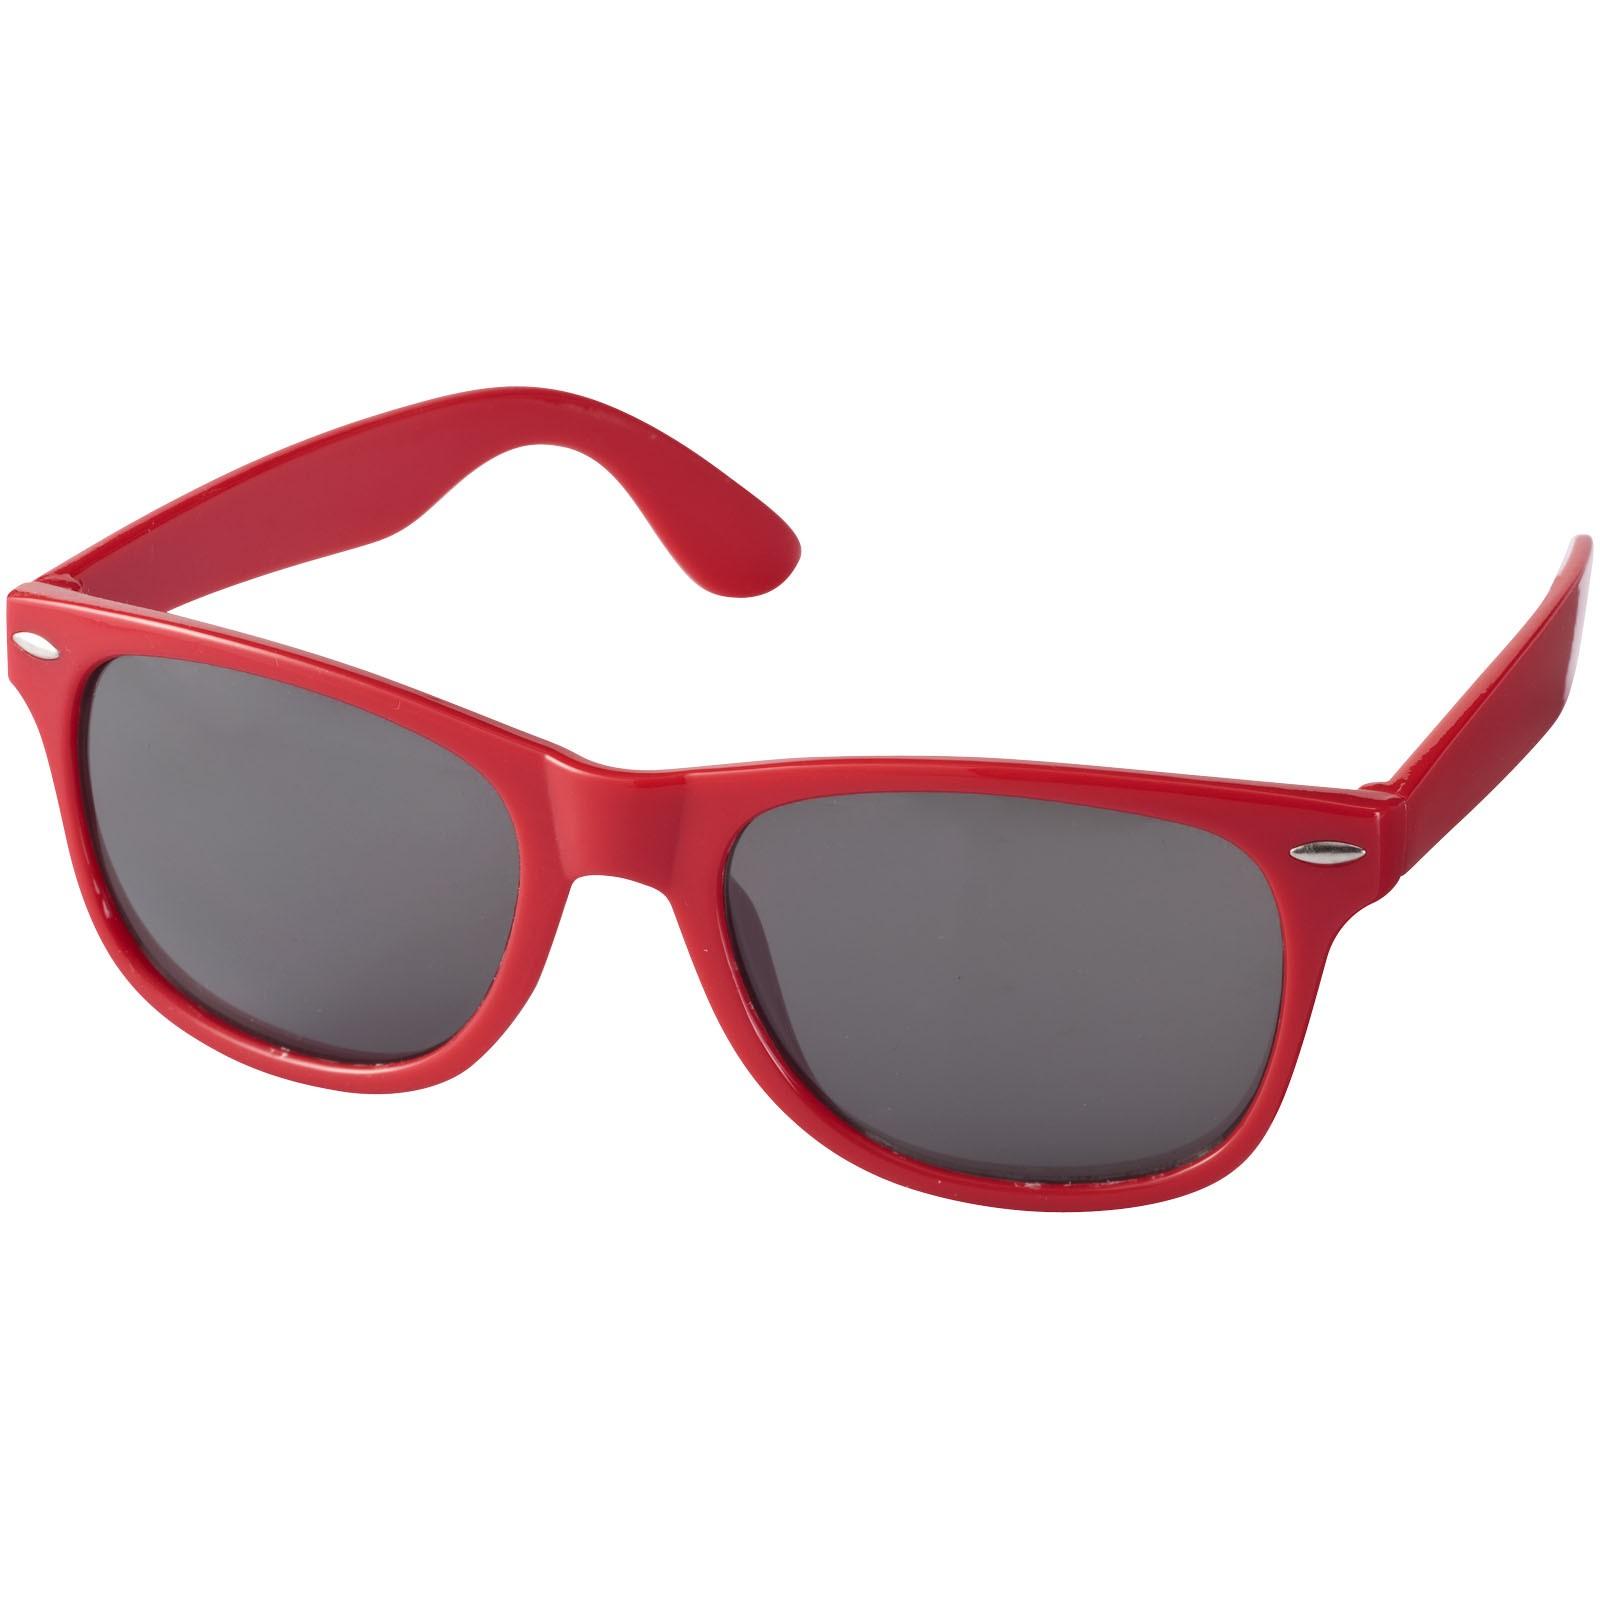 Sun Ray Sonnenbrille - Rot